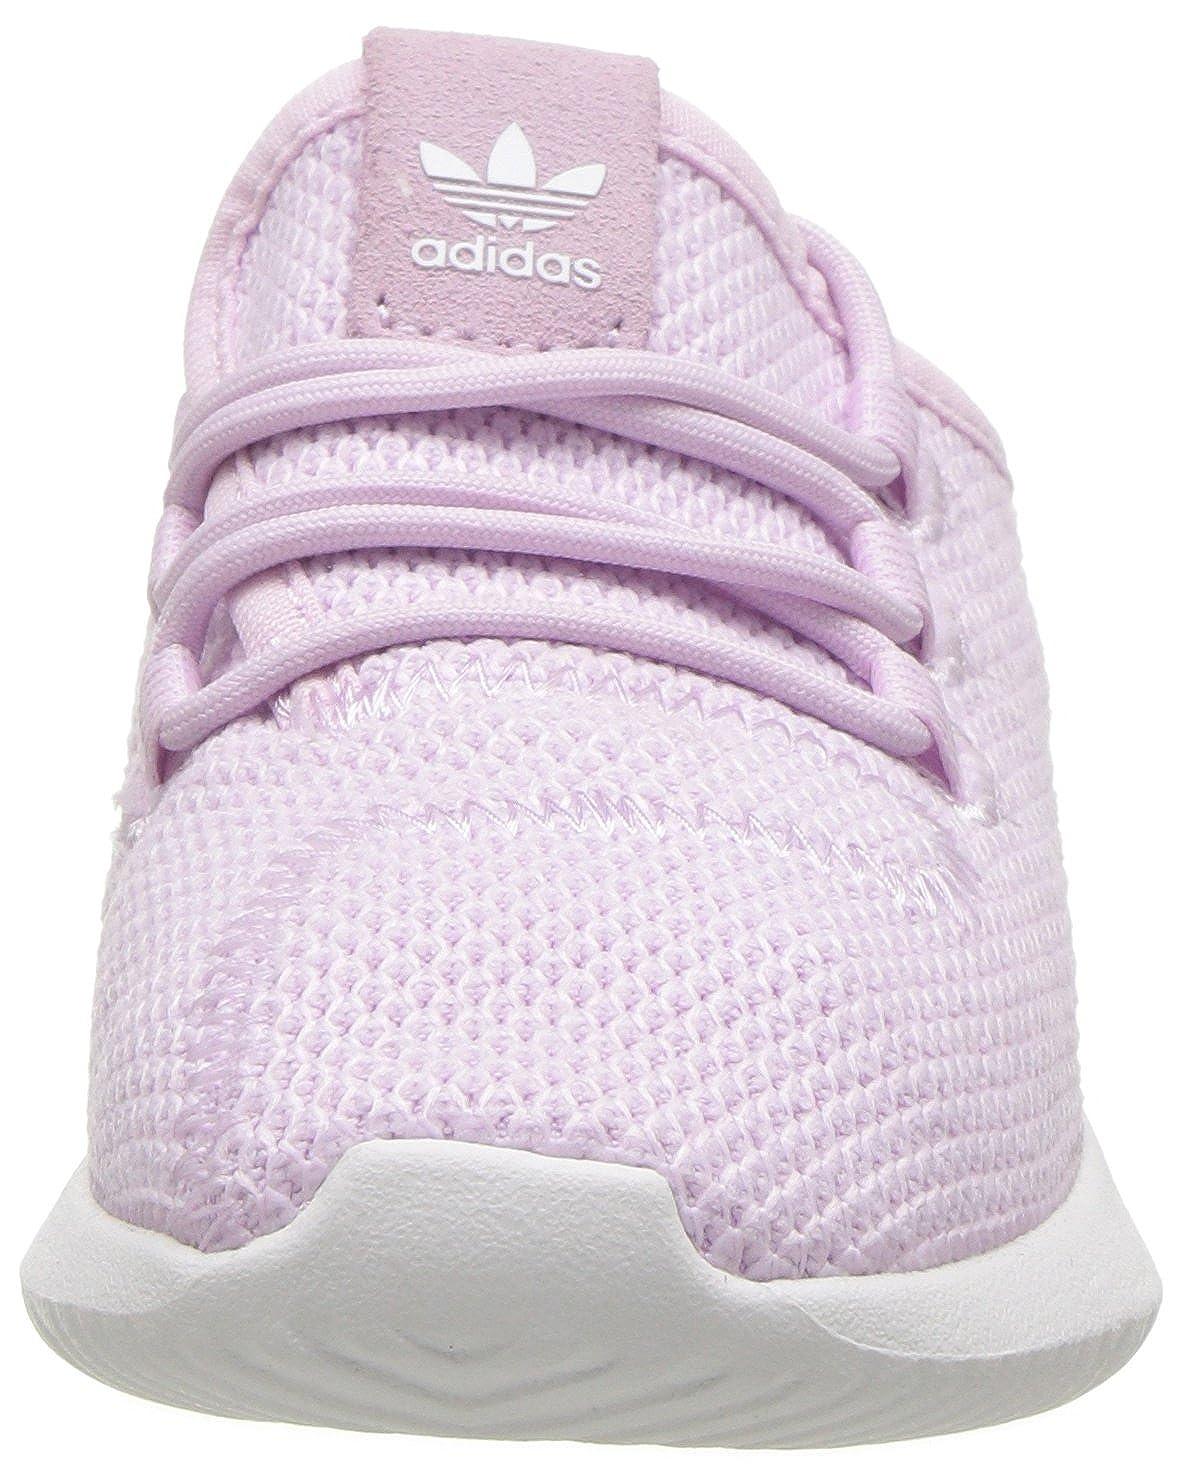 adidas Originals Kids Tubular Shadow I Girls Running Shoe AC8430